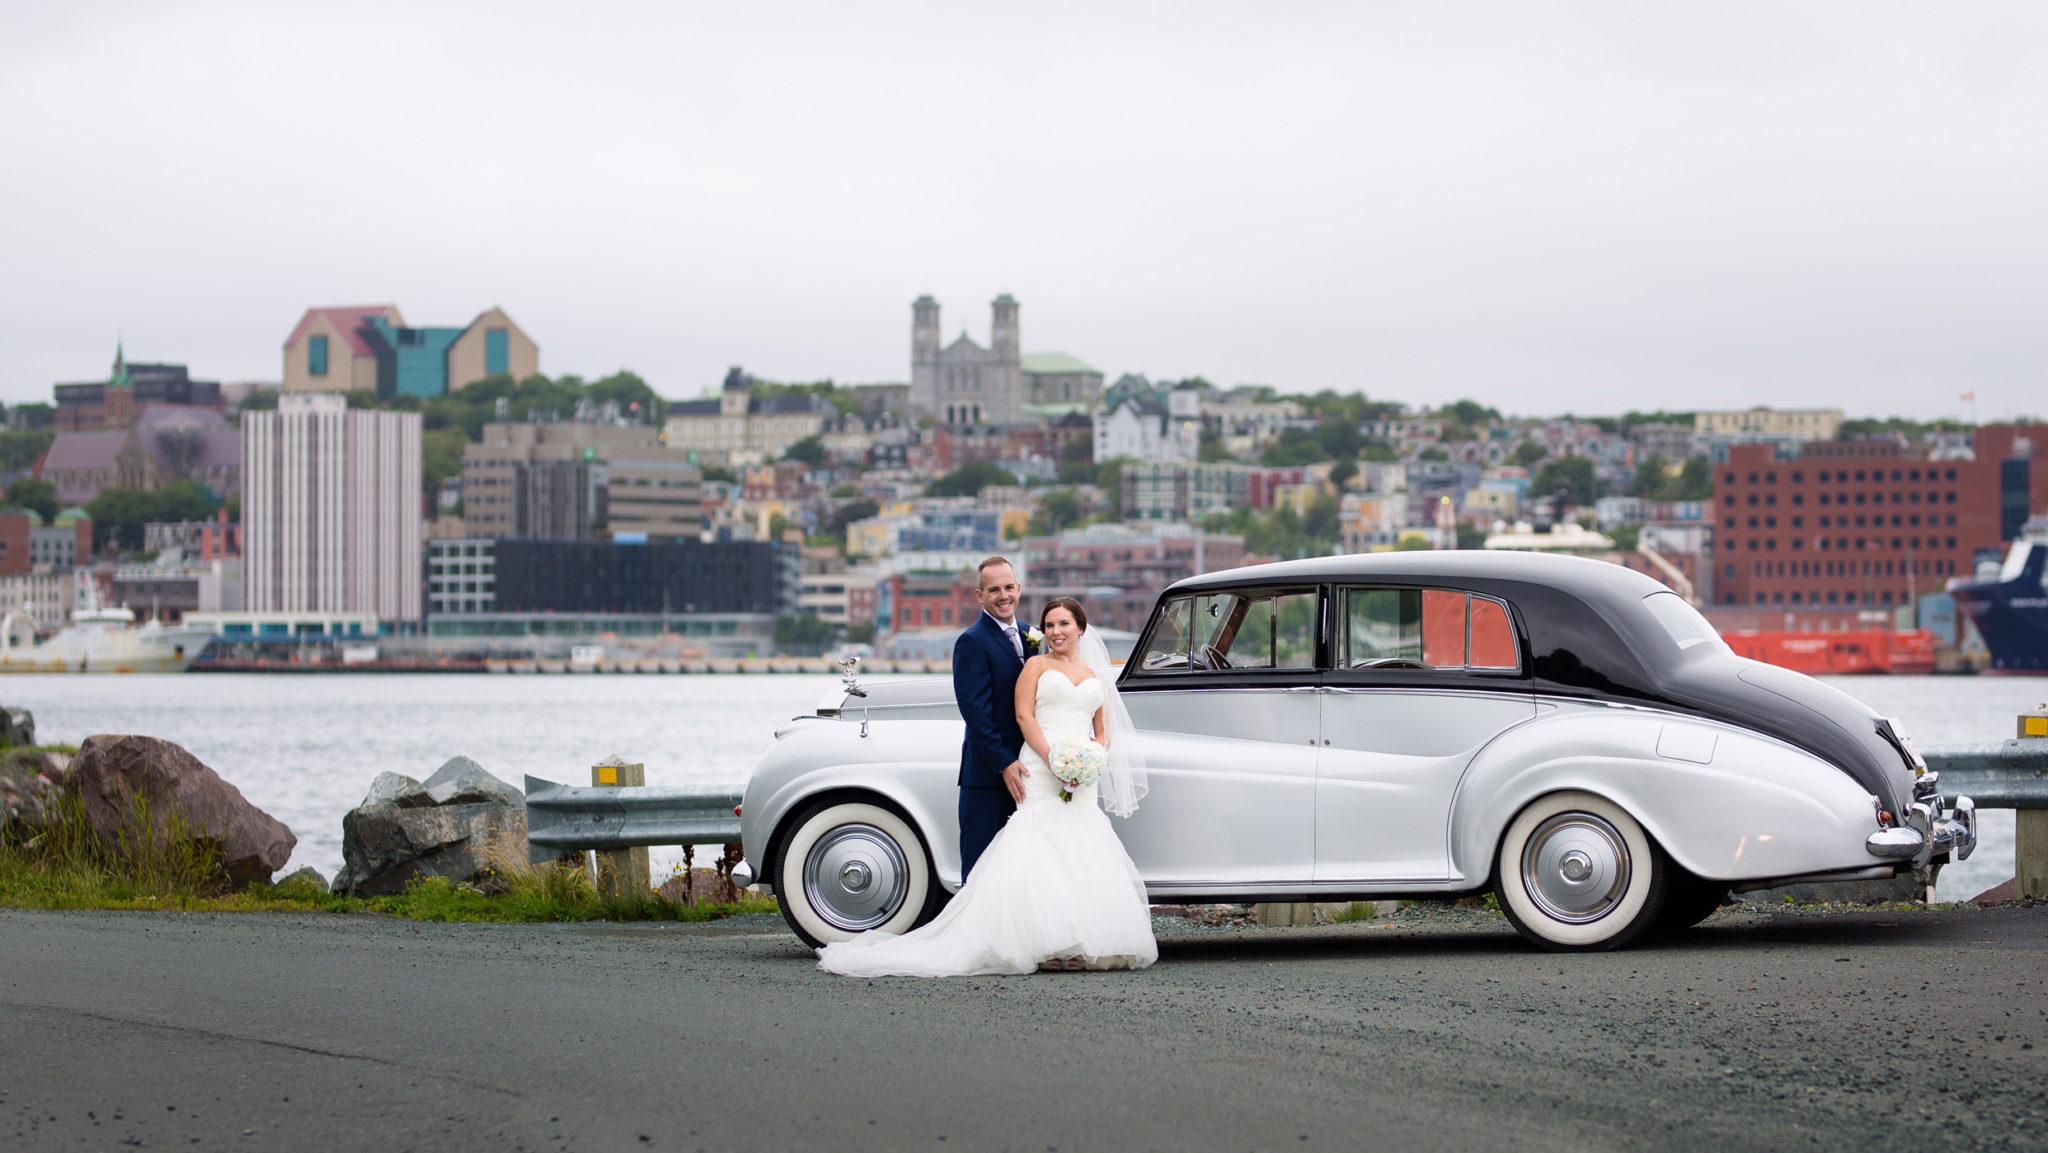 St. John's Wedding Transportation | Classic Carriage